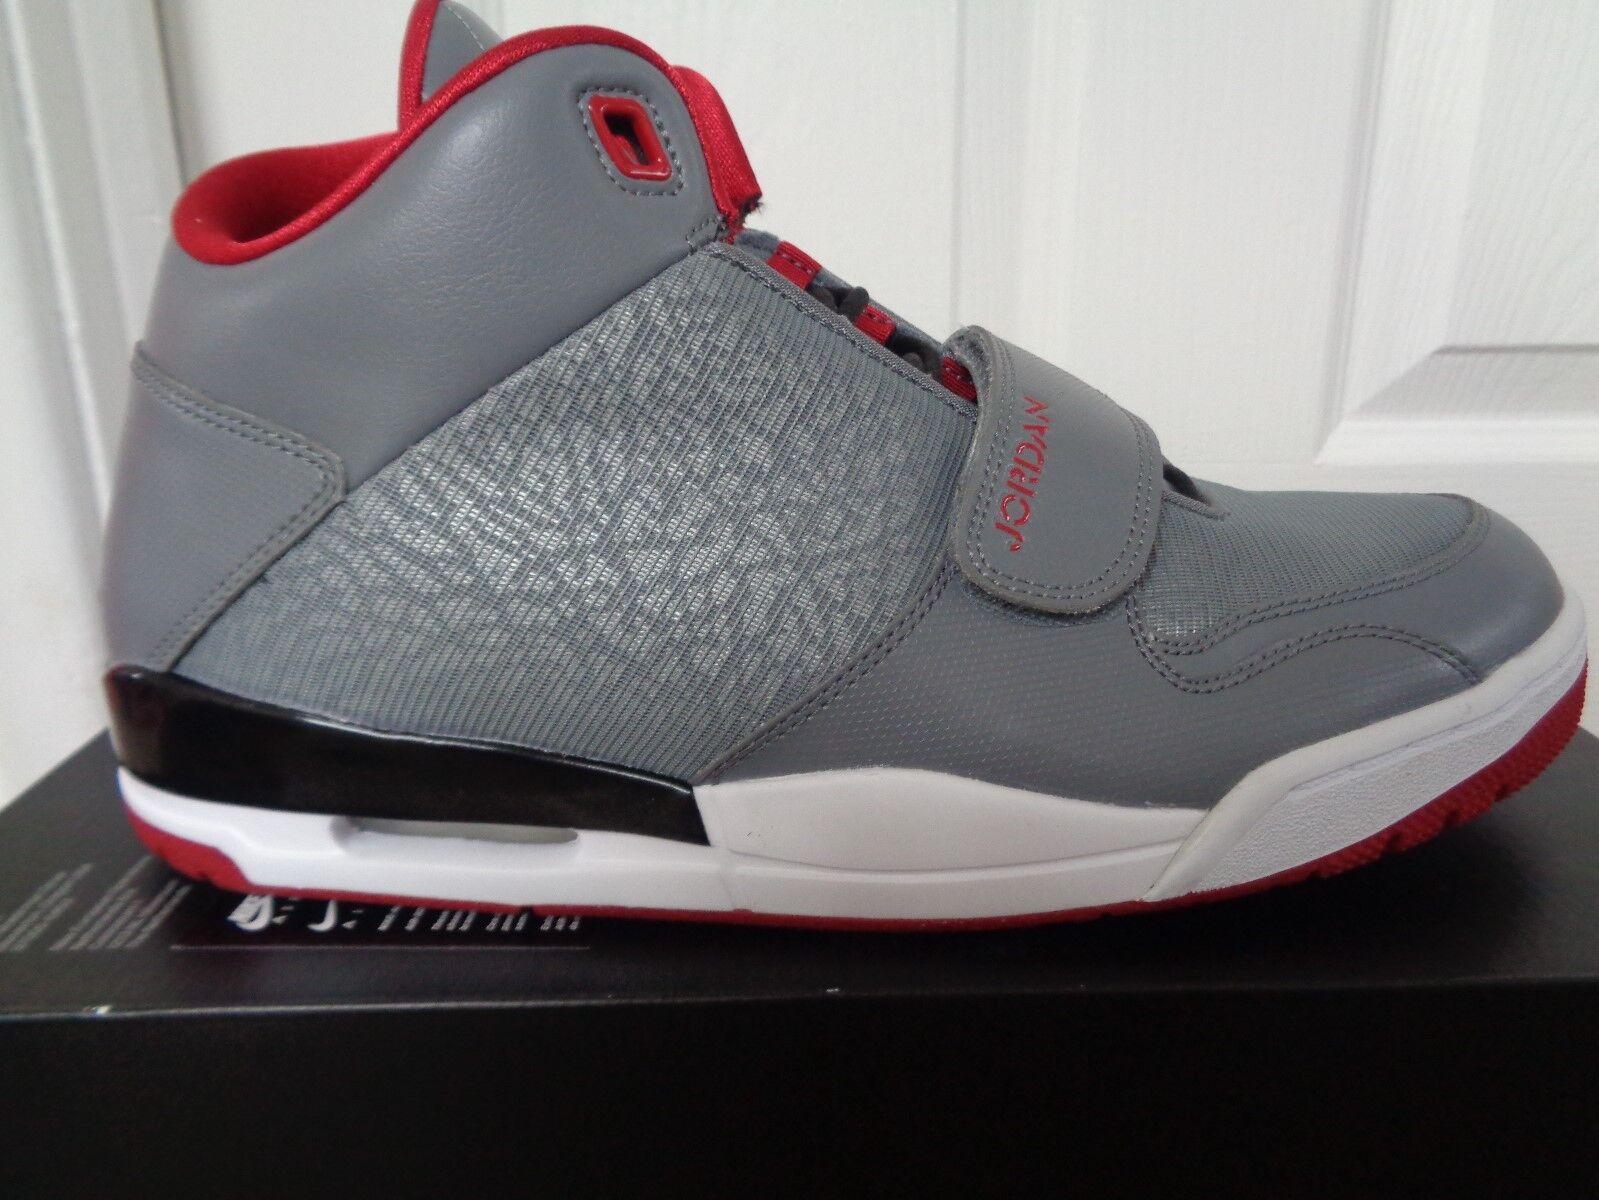 Nike Air Jordan FLTCLB 90 basketball chaussures 602611 022 uk 9.5 eu 445. us 10.5 NEW